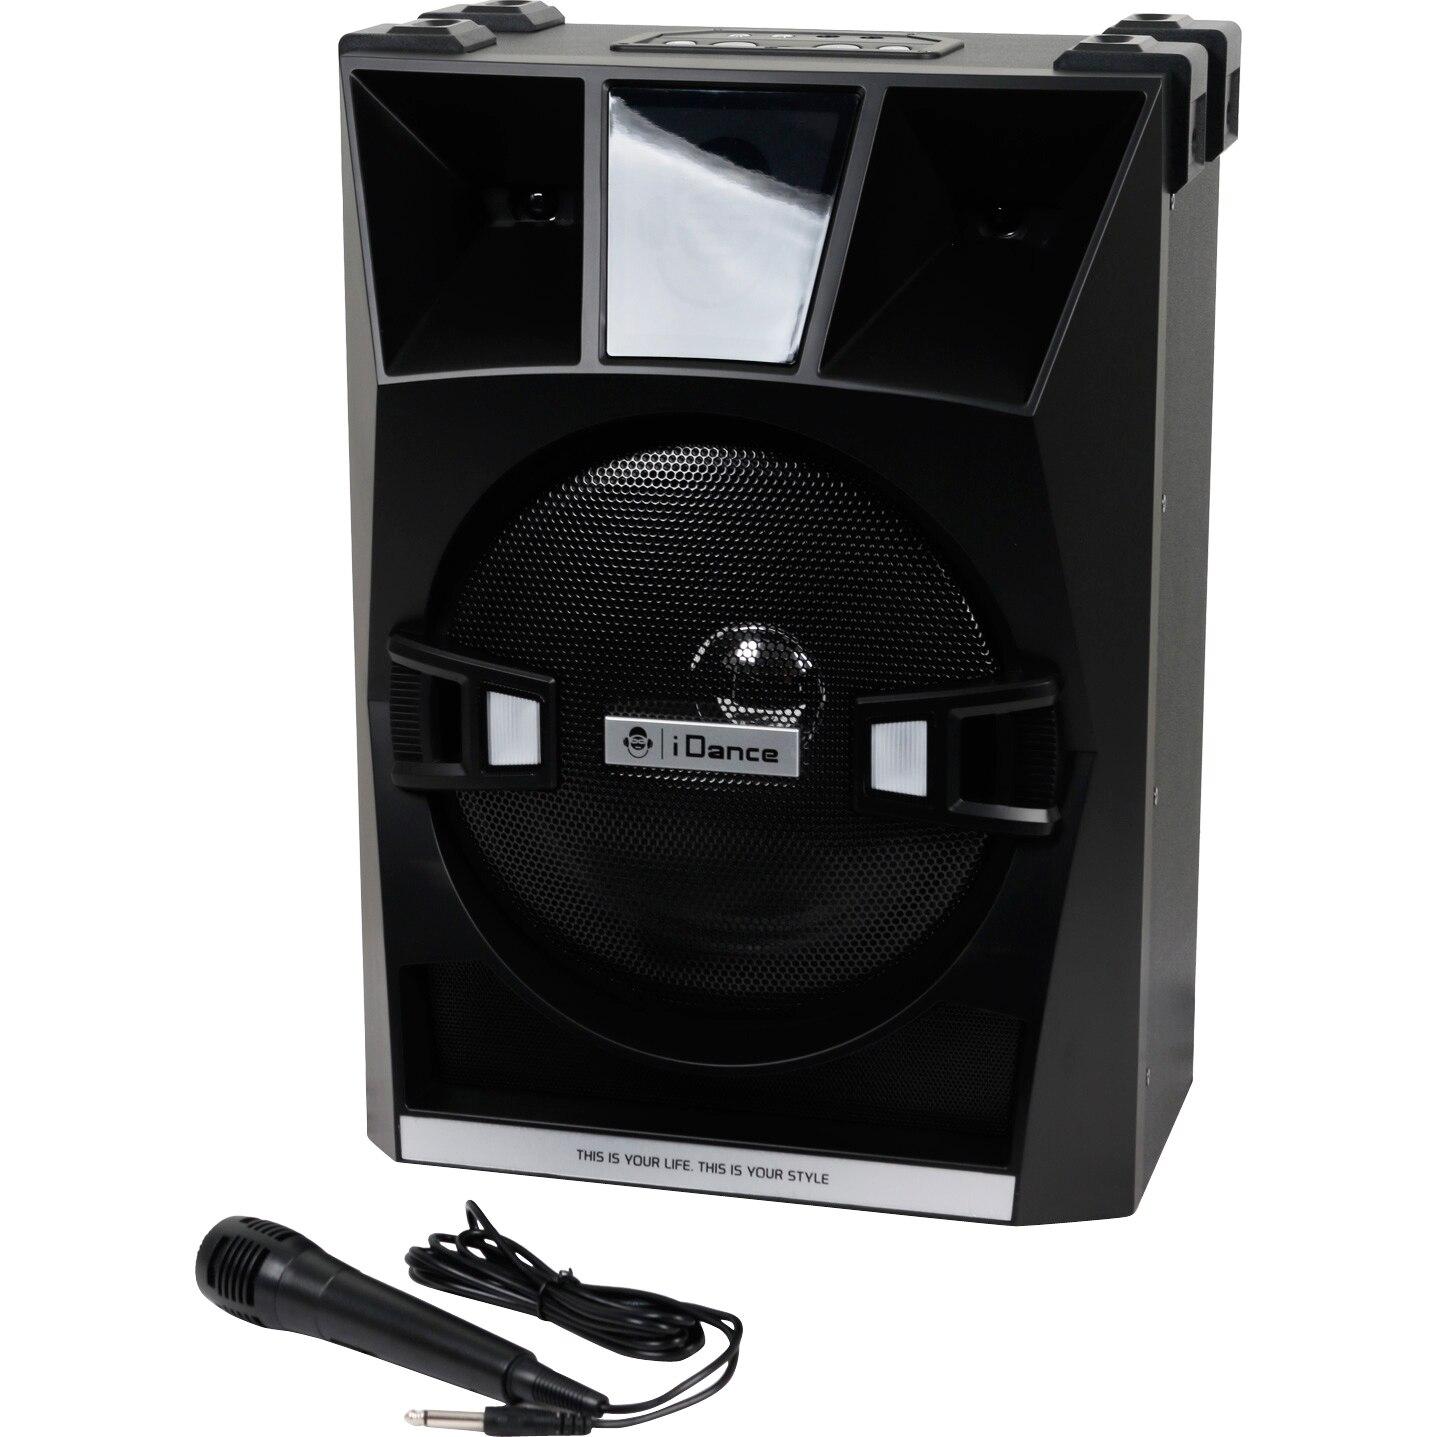 Fotografie Sistem 2 in 1 iDance XD30 A v2, karaoke& DJ, 200W, Bluetooth, mixer incorporat cu efect Echo, joc de lumini, USB, aplicatie IOS si Android